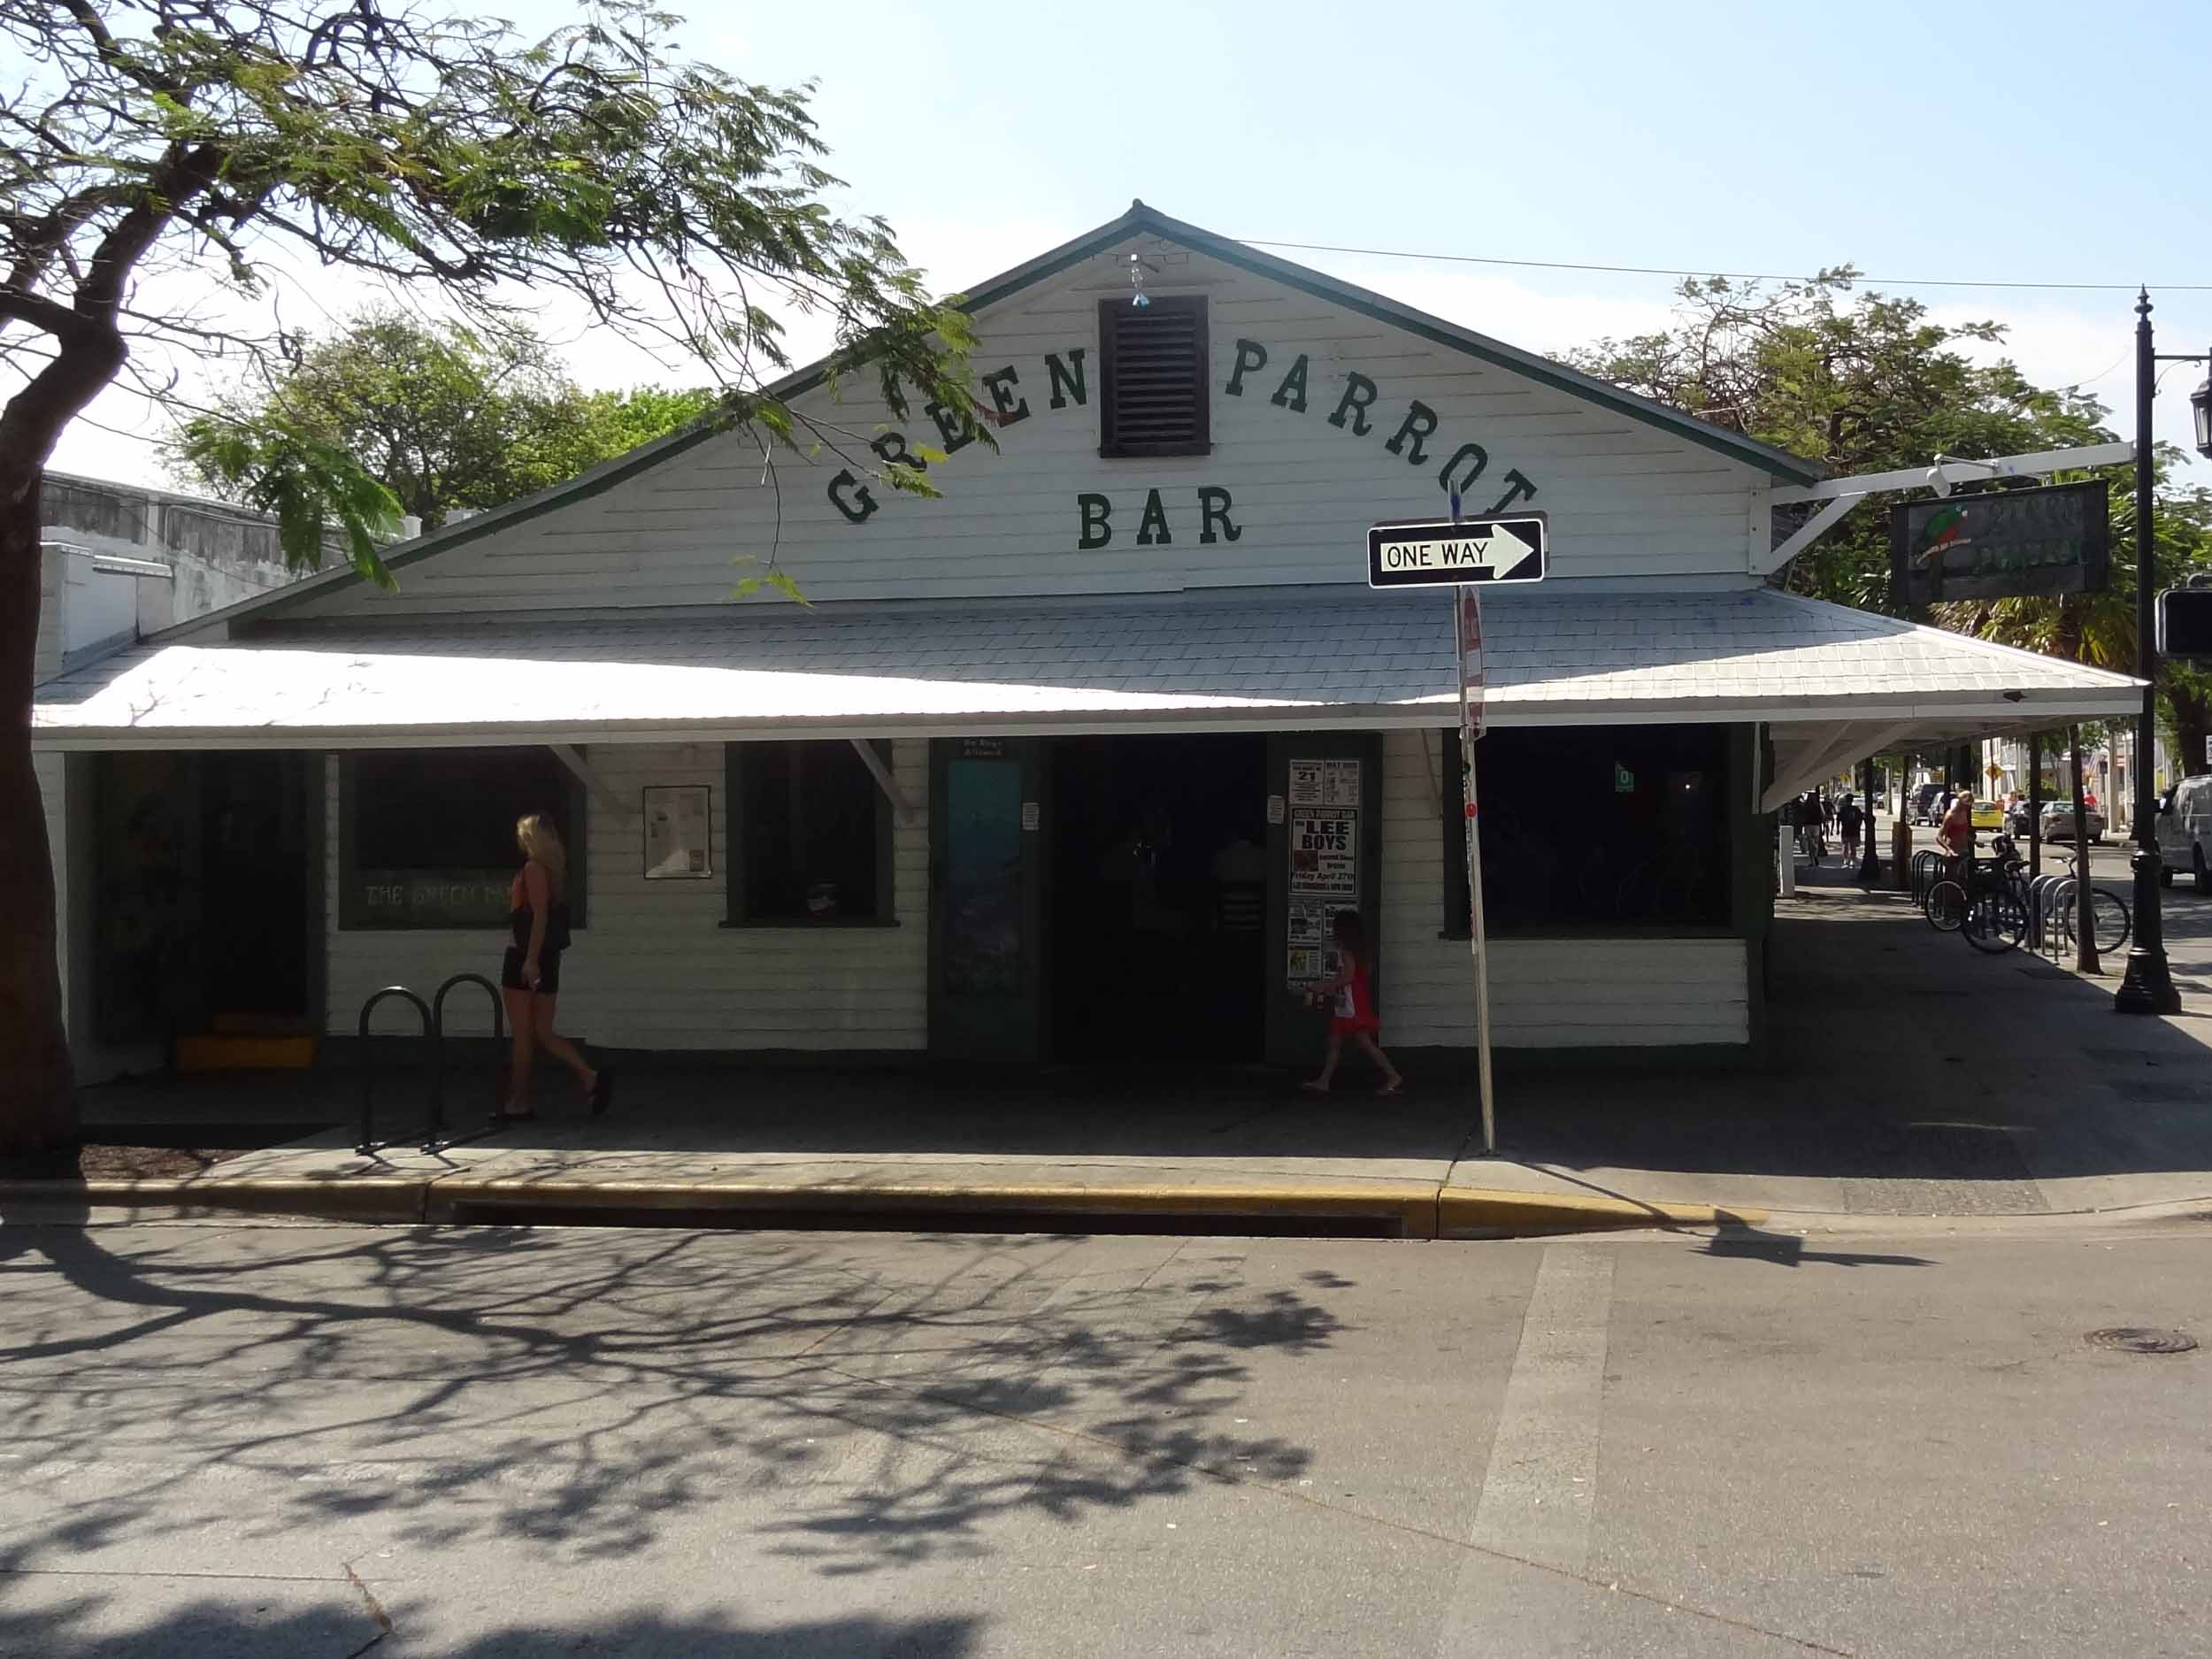 Green Parrot Bar Entrance